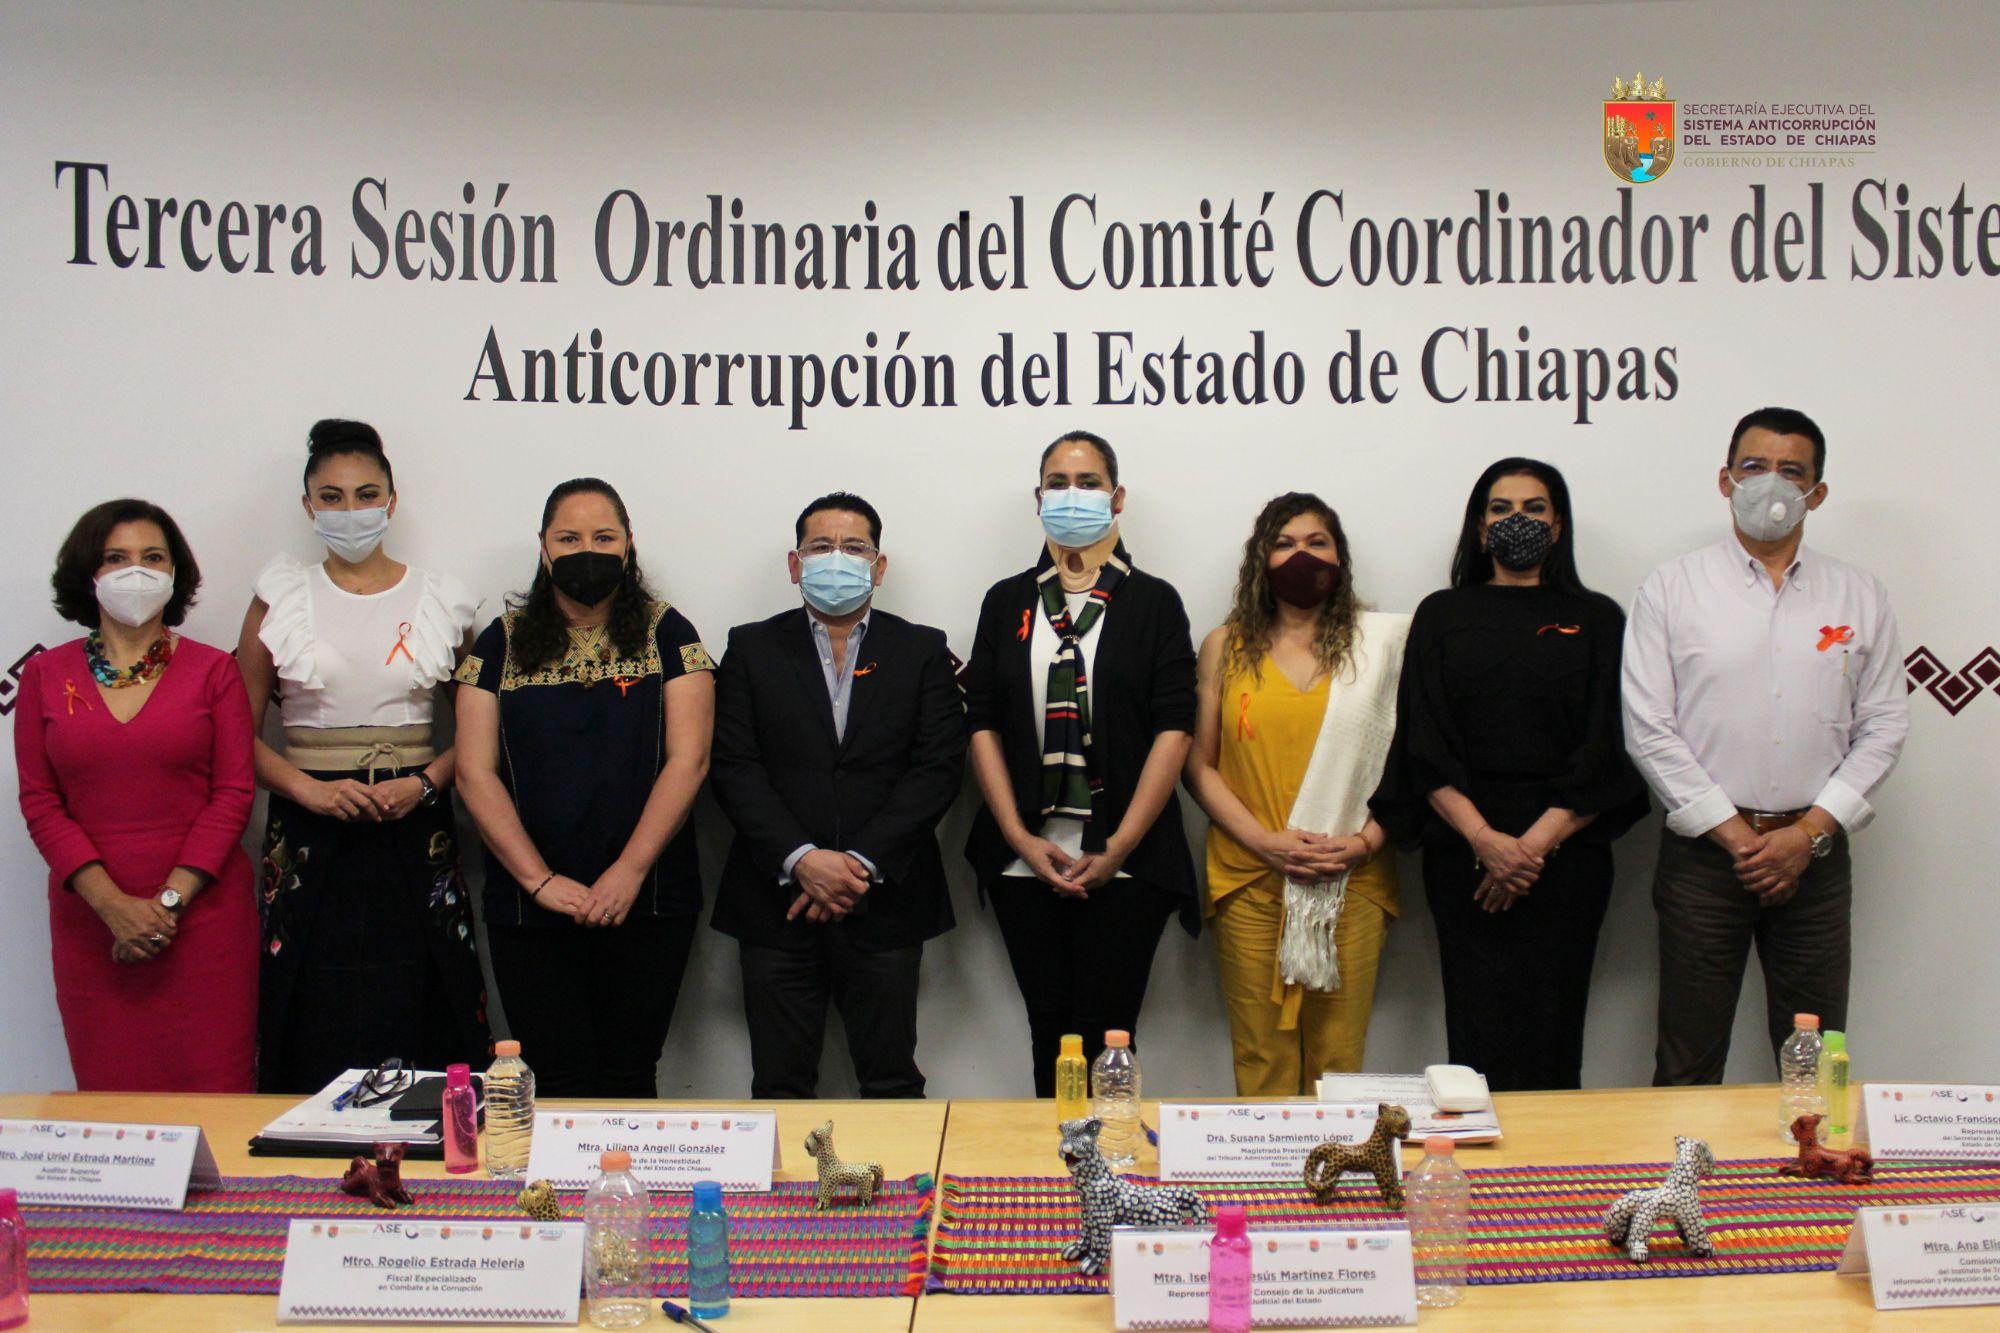 Tercera Sesión del Comité Coordinador del SAECH